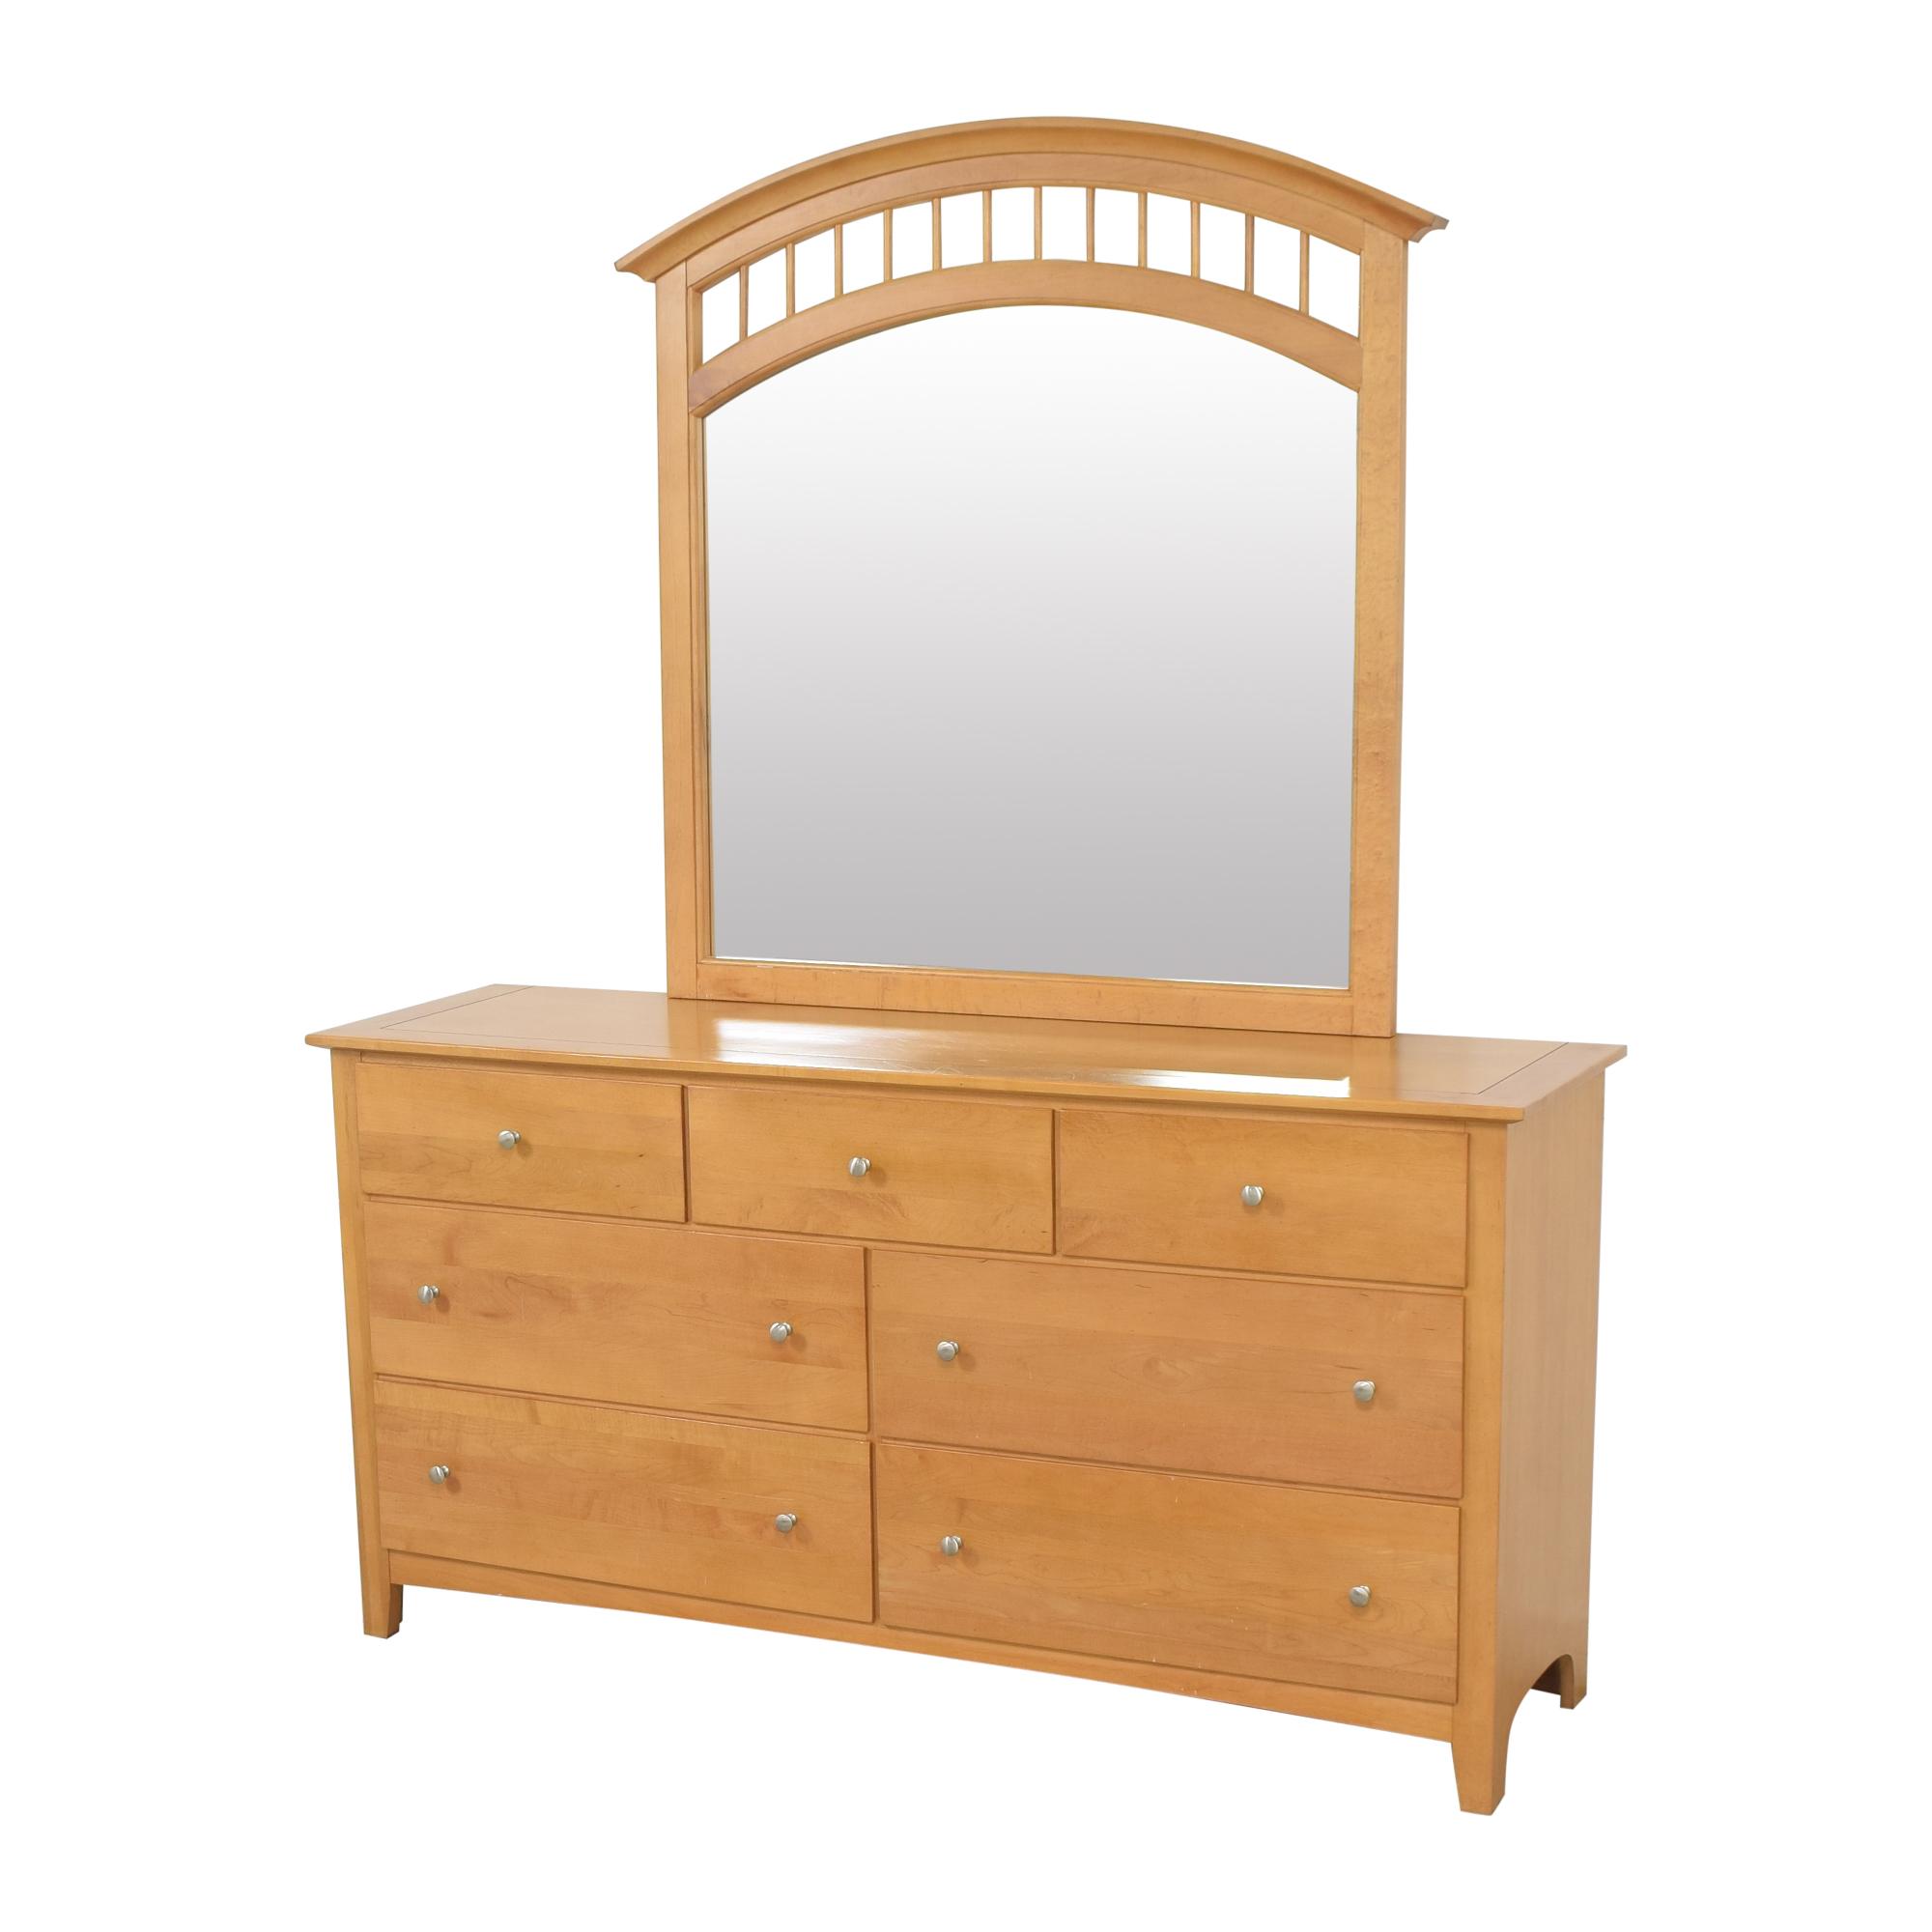 Stanley Furniture Stanley Furniture Seven Drawer Dresser with Mirror for sale